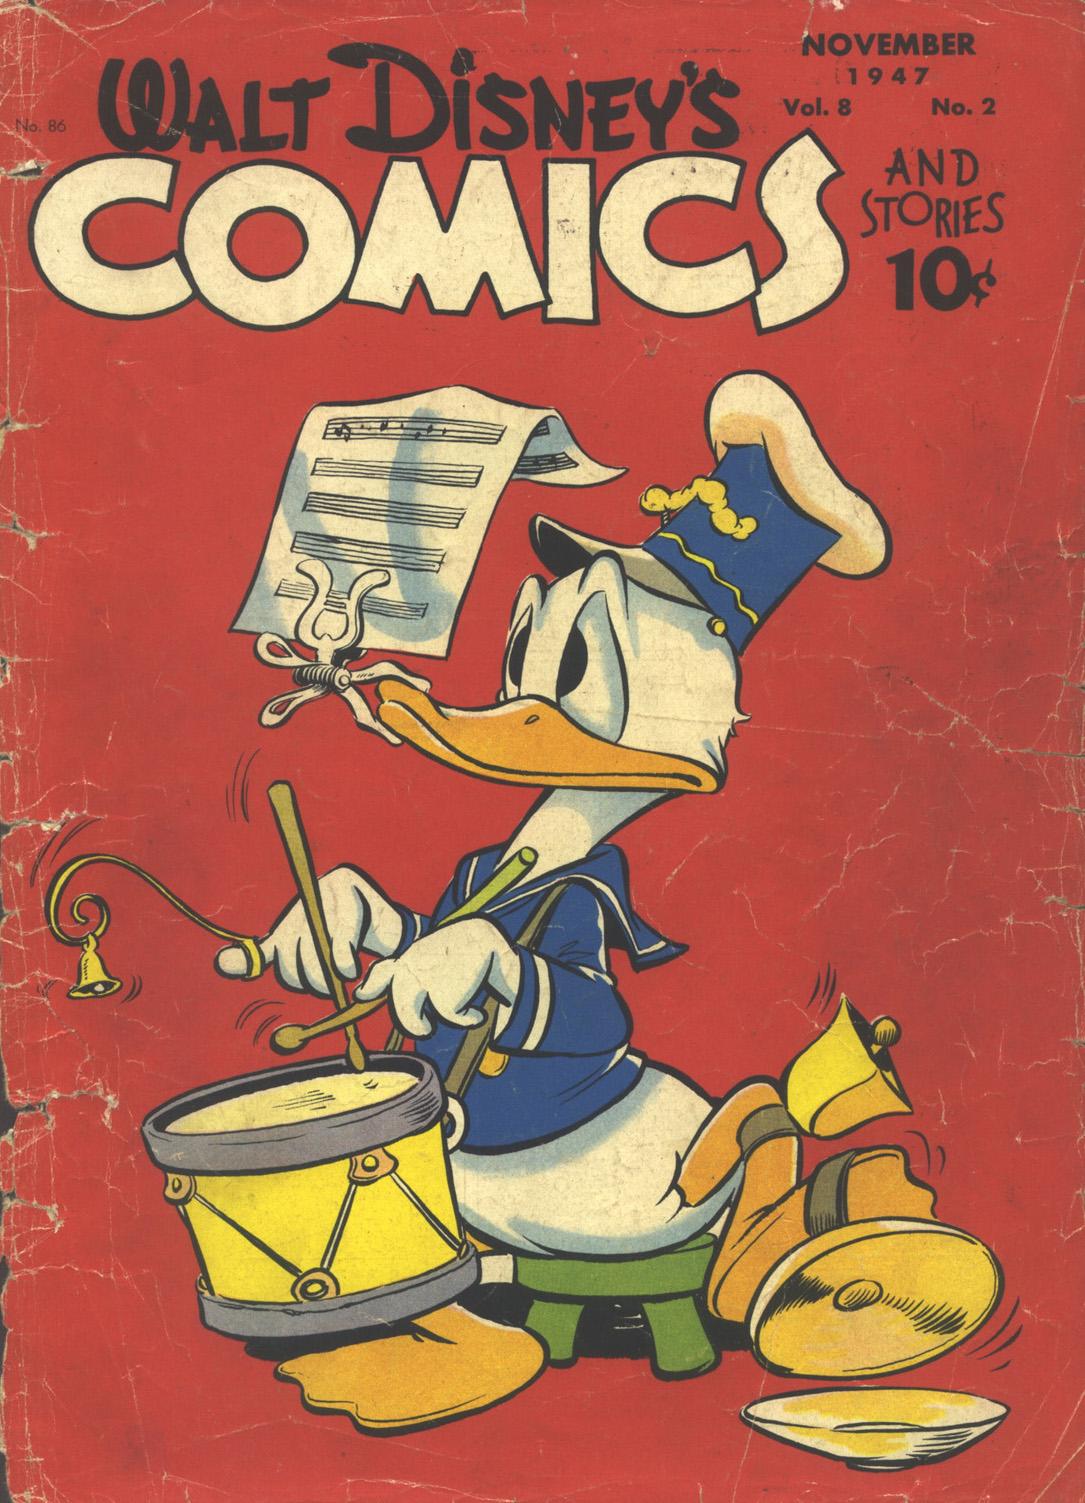 Walt Disneys Comics and Stories 86 Page 1